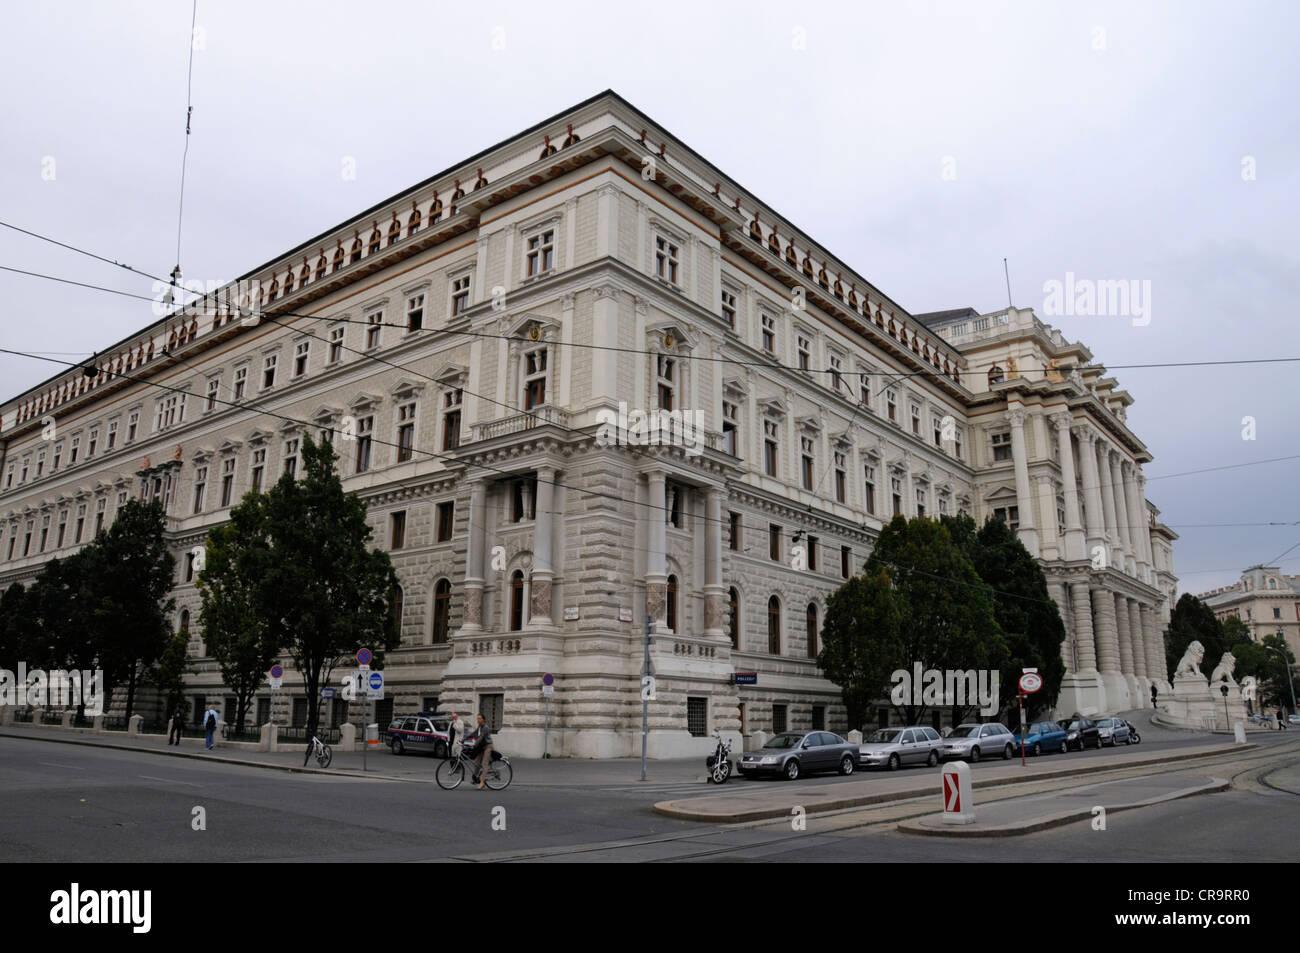 Justizpalast (Justizpalast) in Schmerlingplatz, zentralen Bezirk Innere Stadt in Wien, Österreich-Wien, Österreich Stockbild